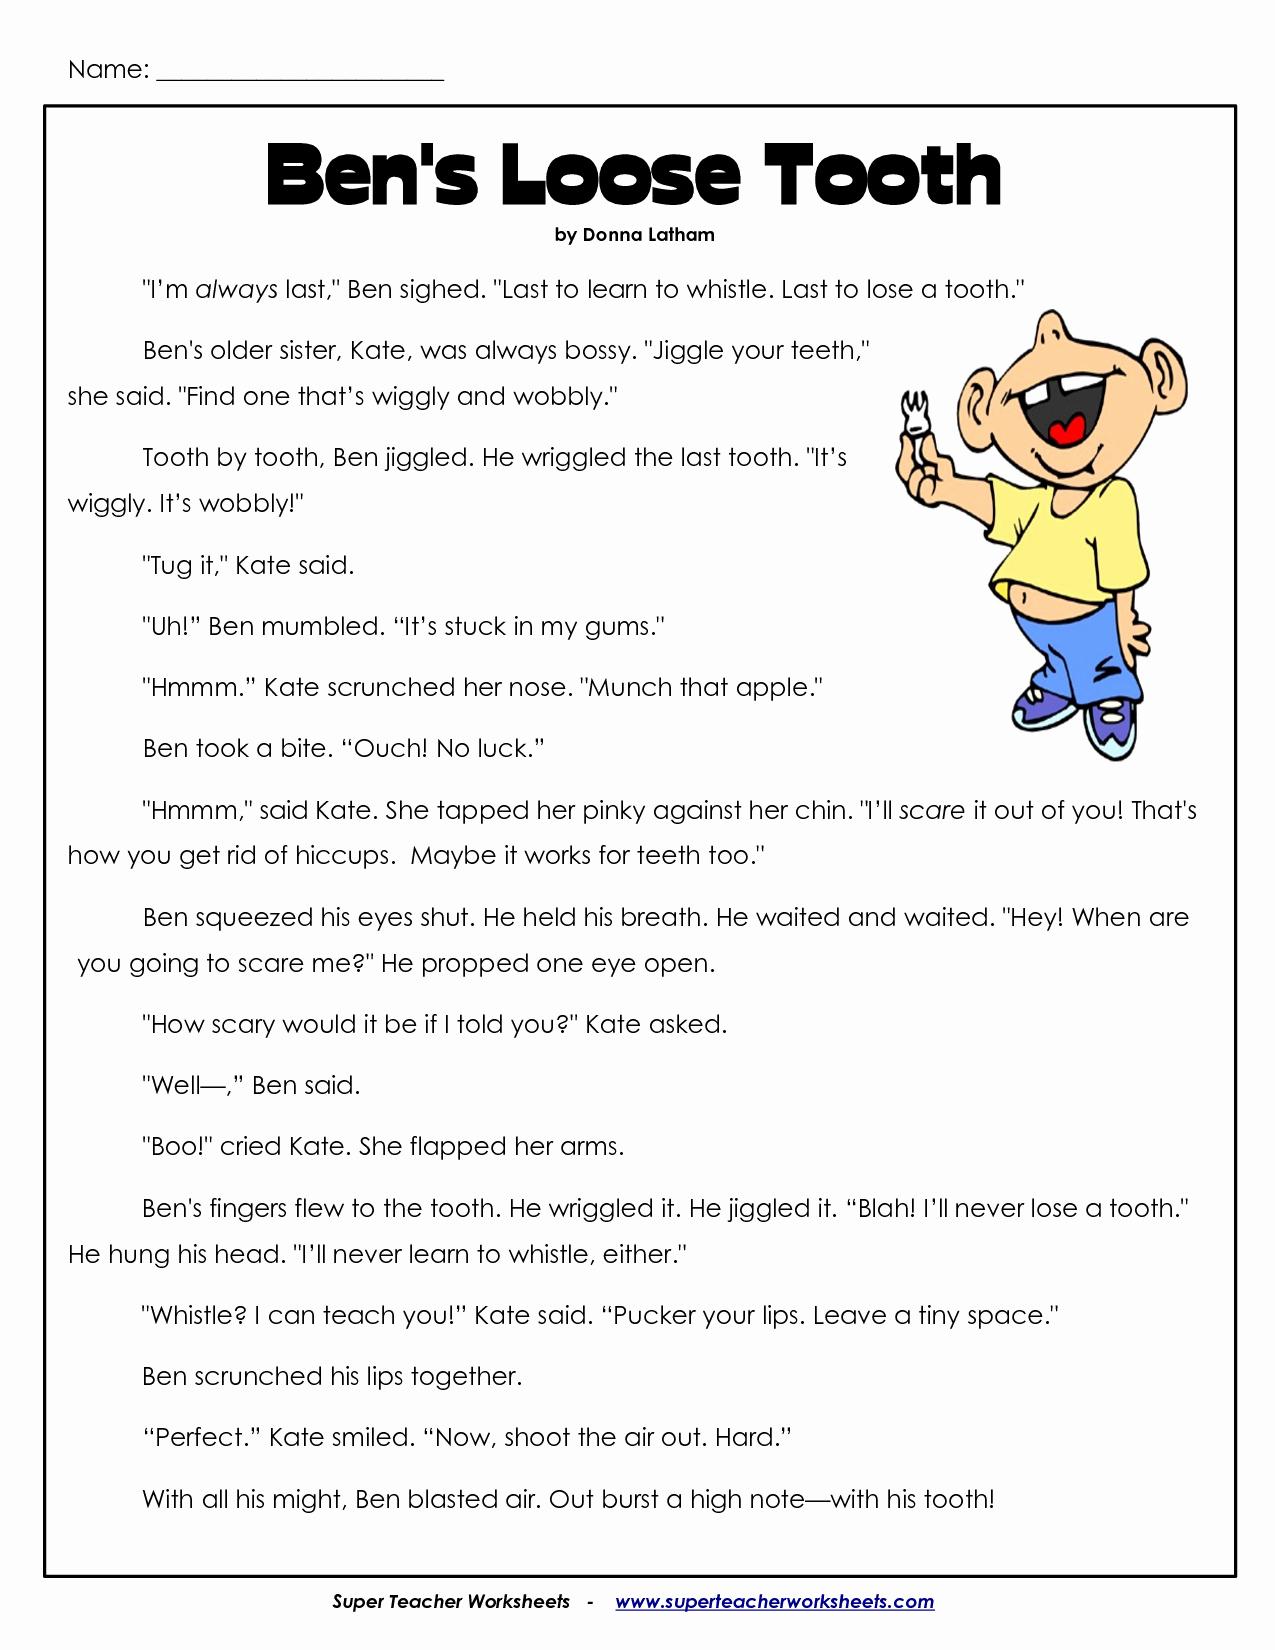 Proofreading Worksheets 3rd Grade Inspirational Reading Prehension for 3rd Grade Worksheets